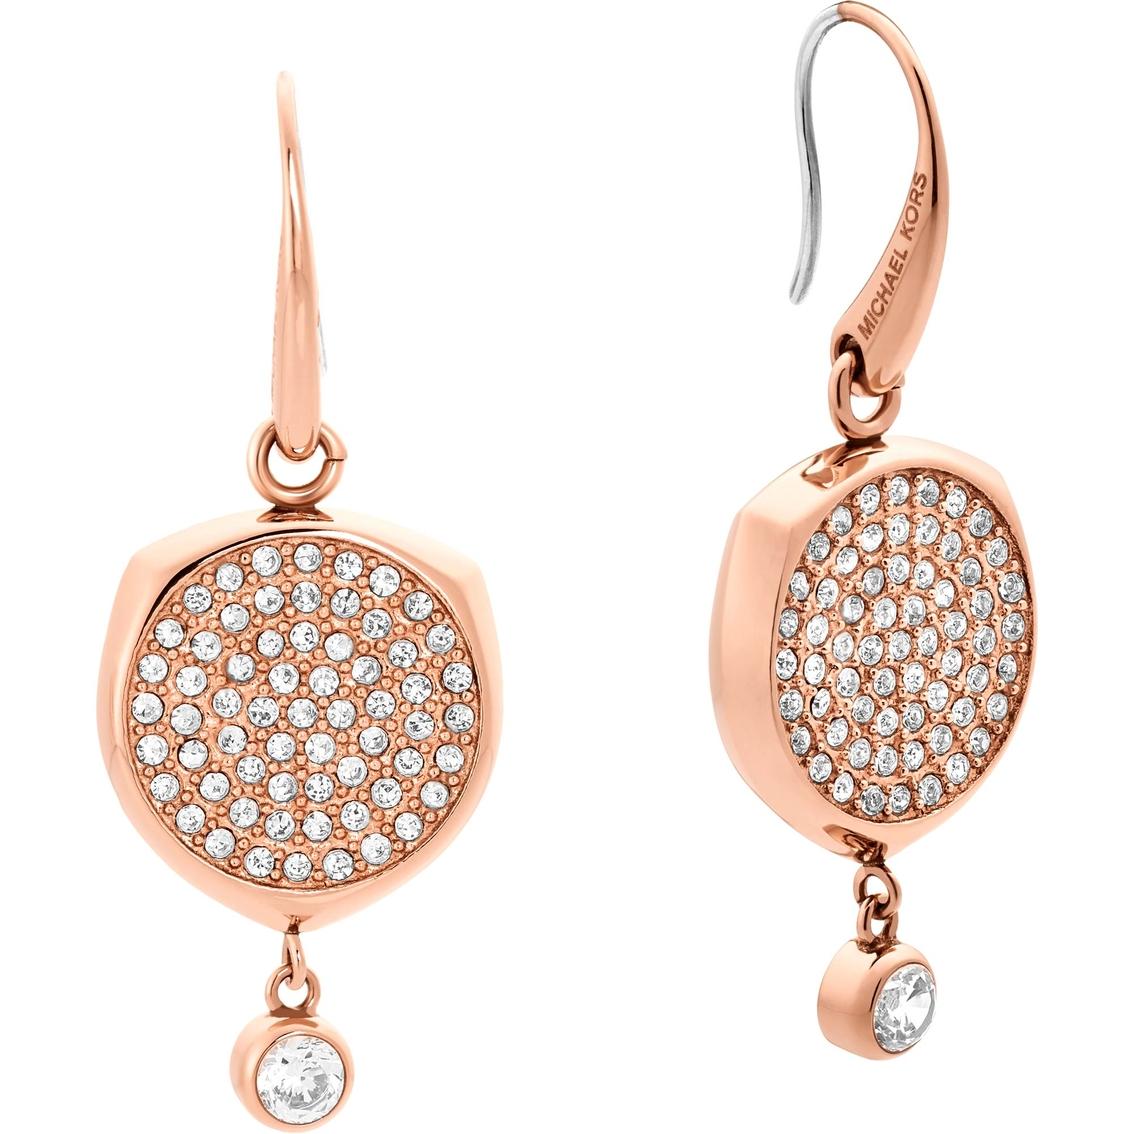 a1c88e5f2a09 Michael Kors Beyond Brilliant Rose Goldtone Earrings